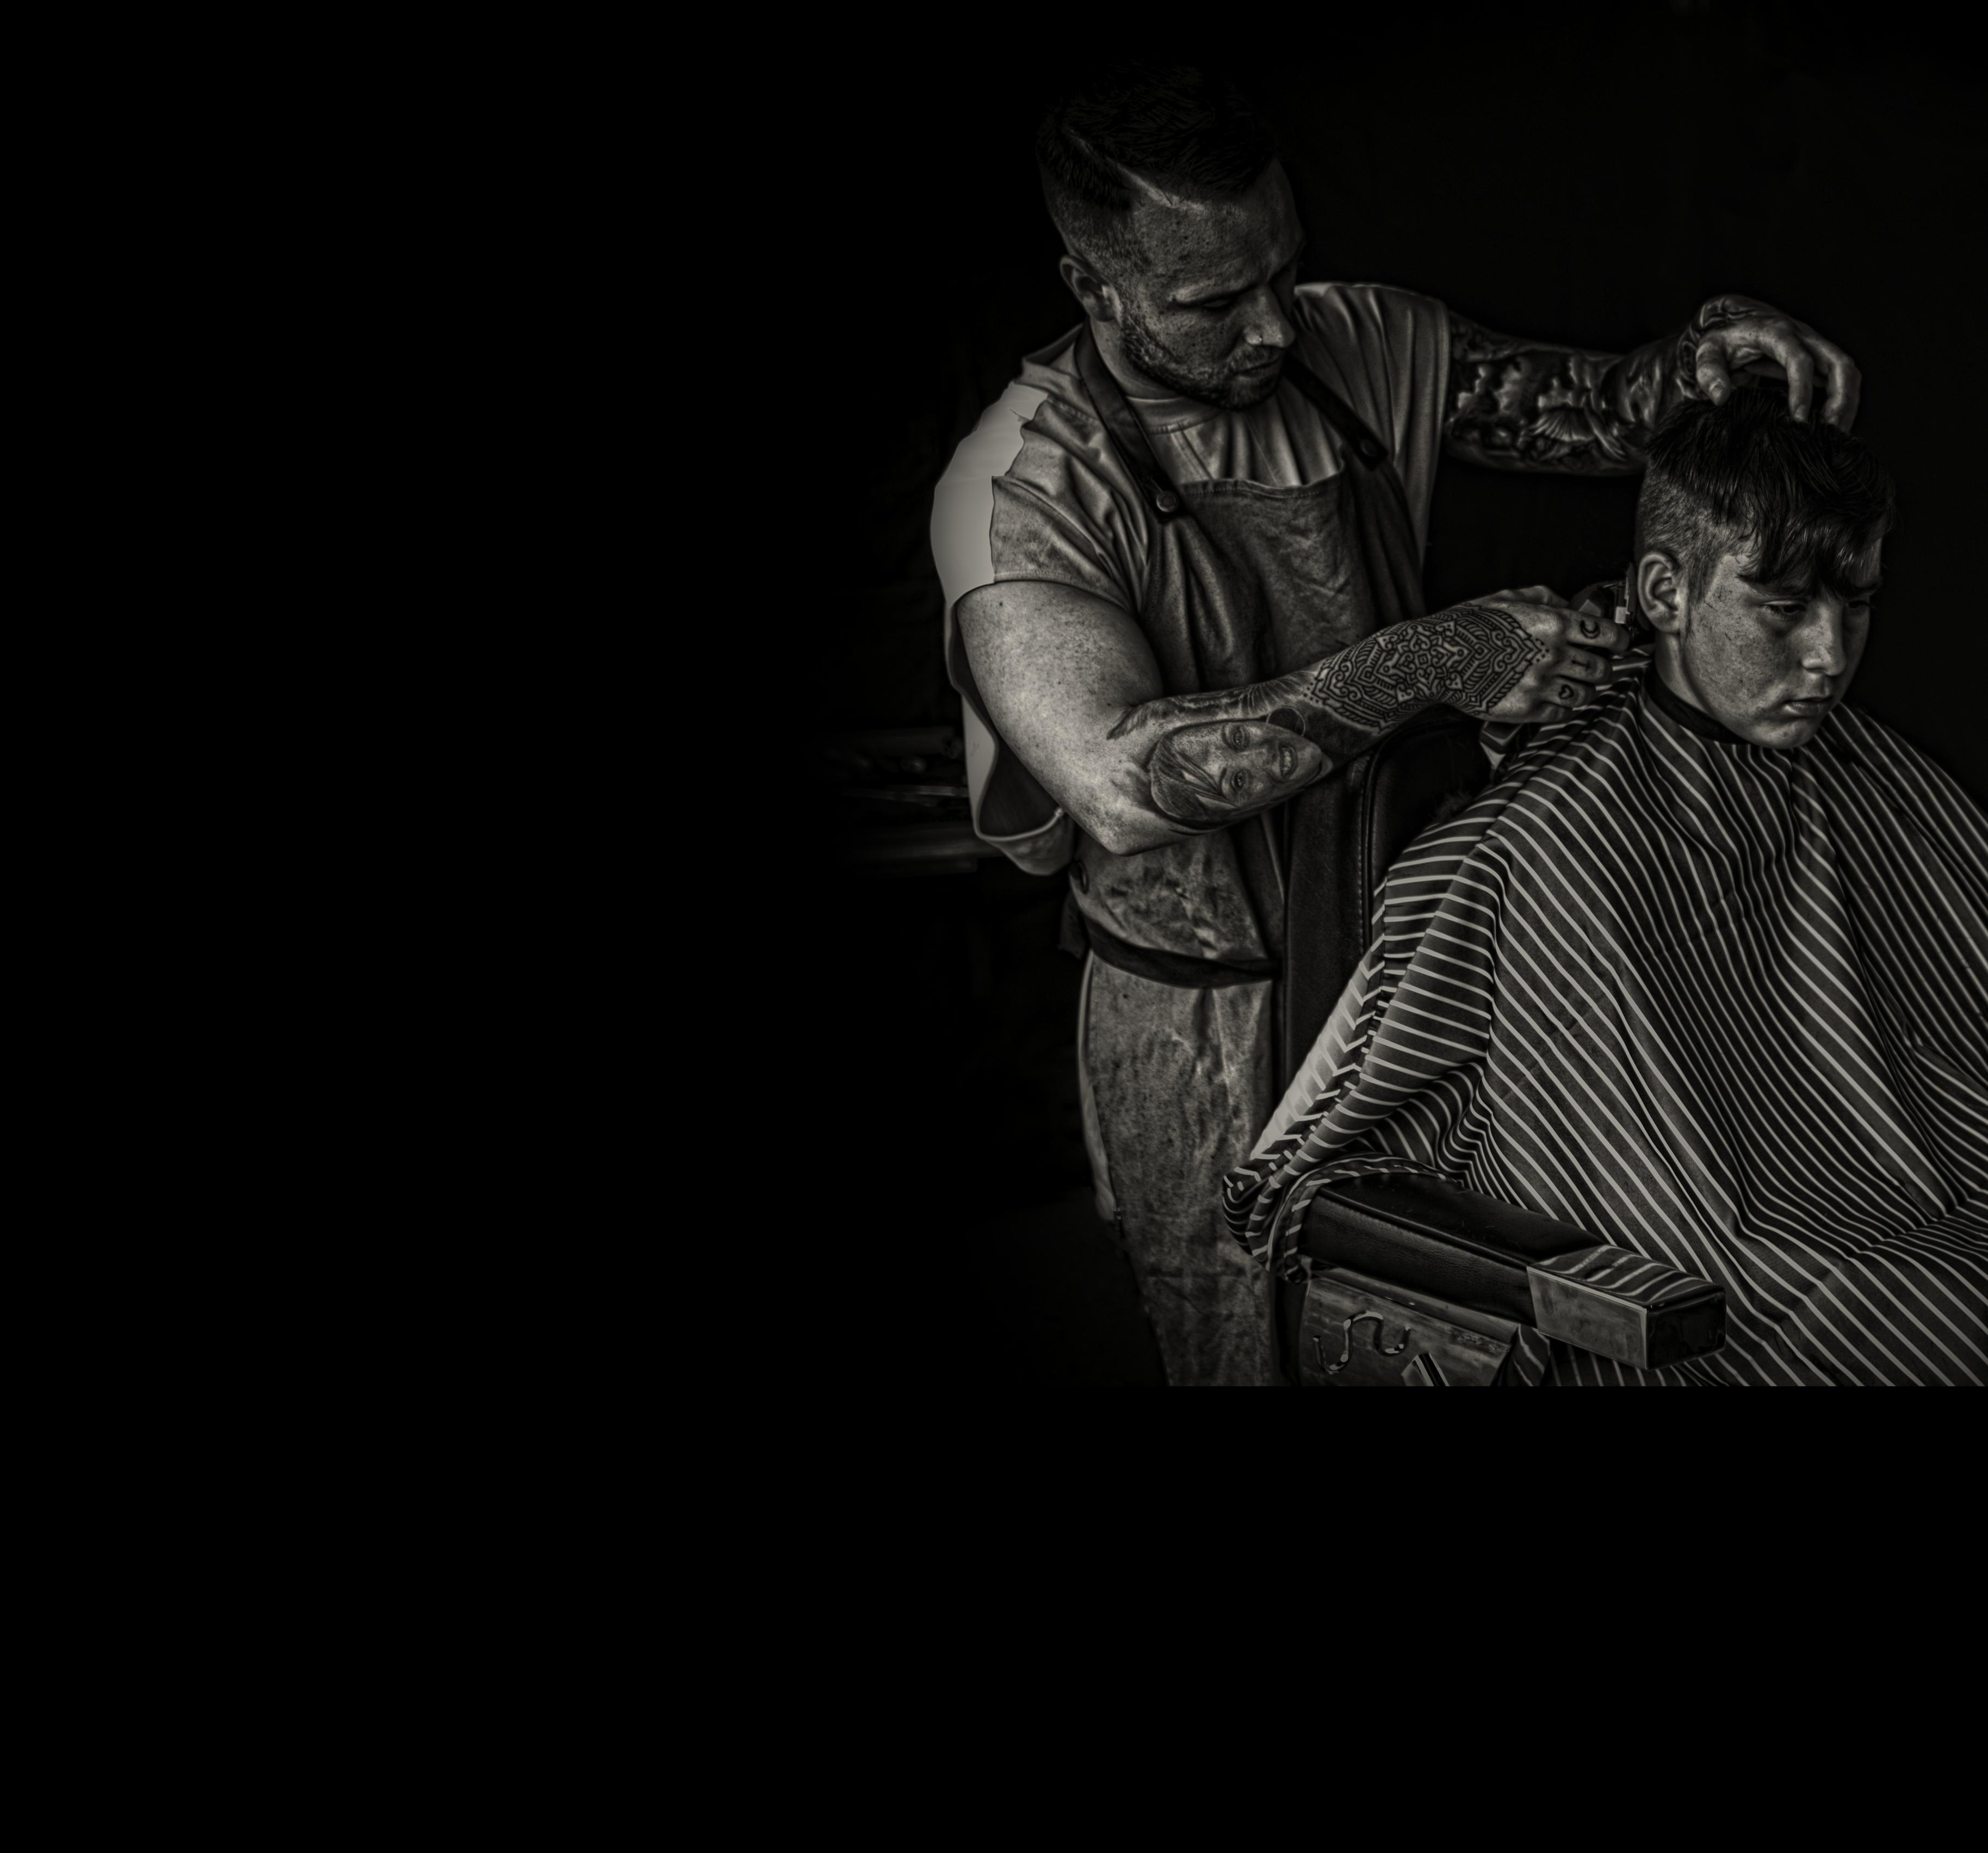 barber png